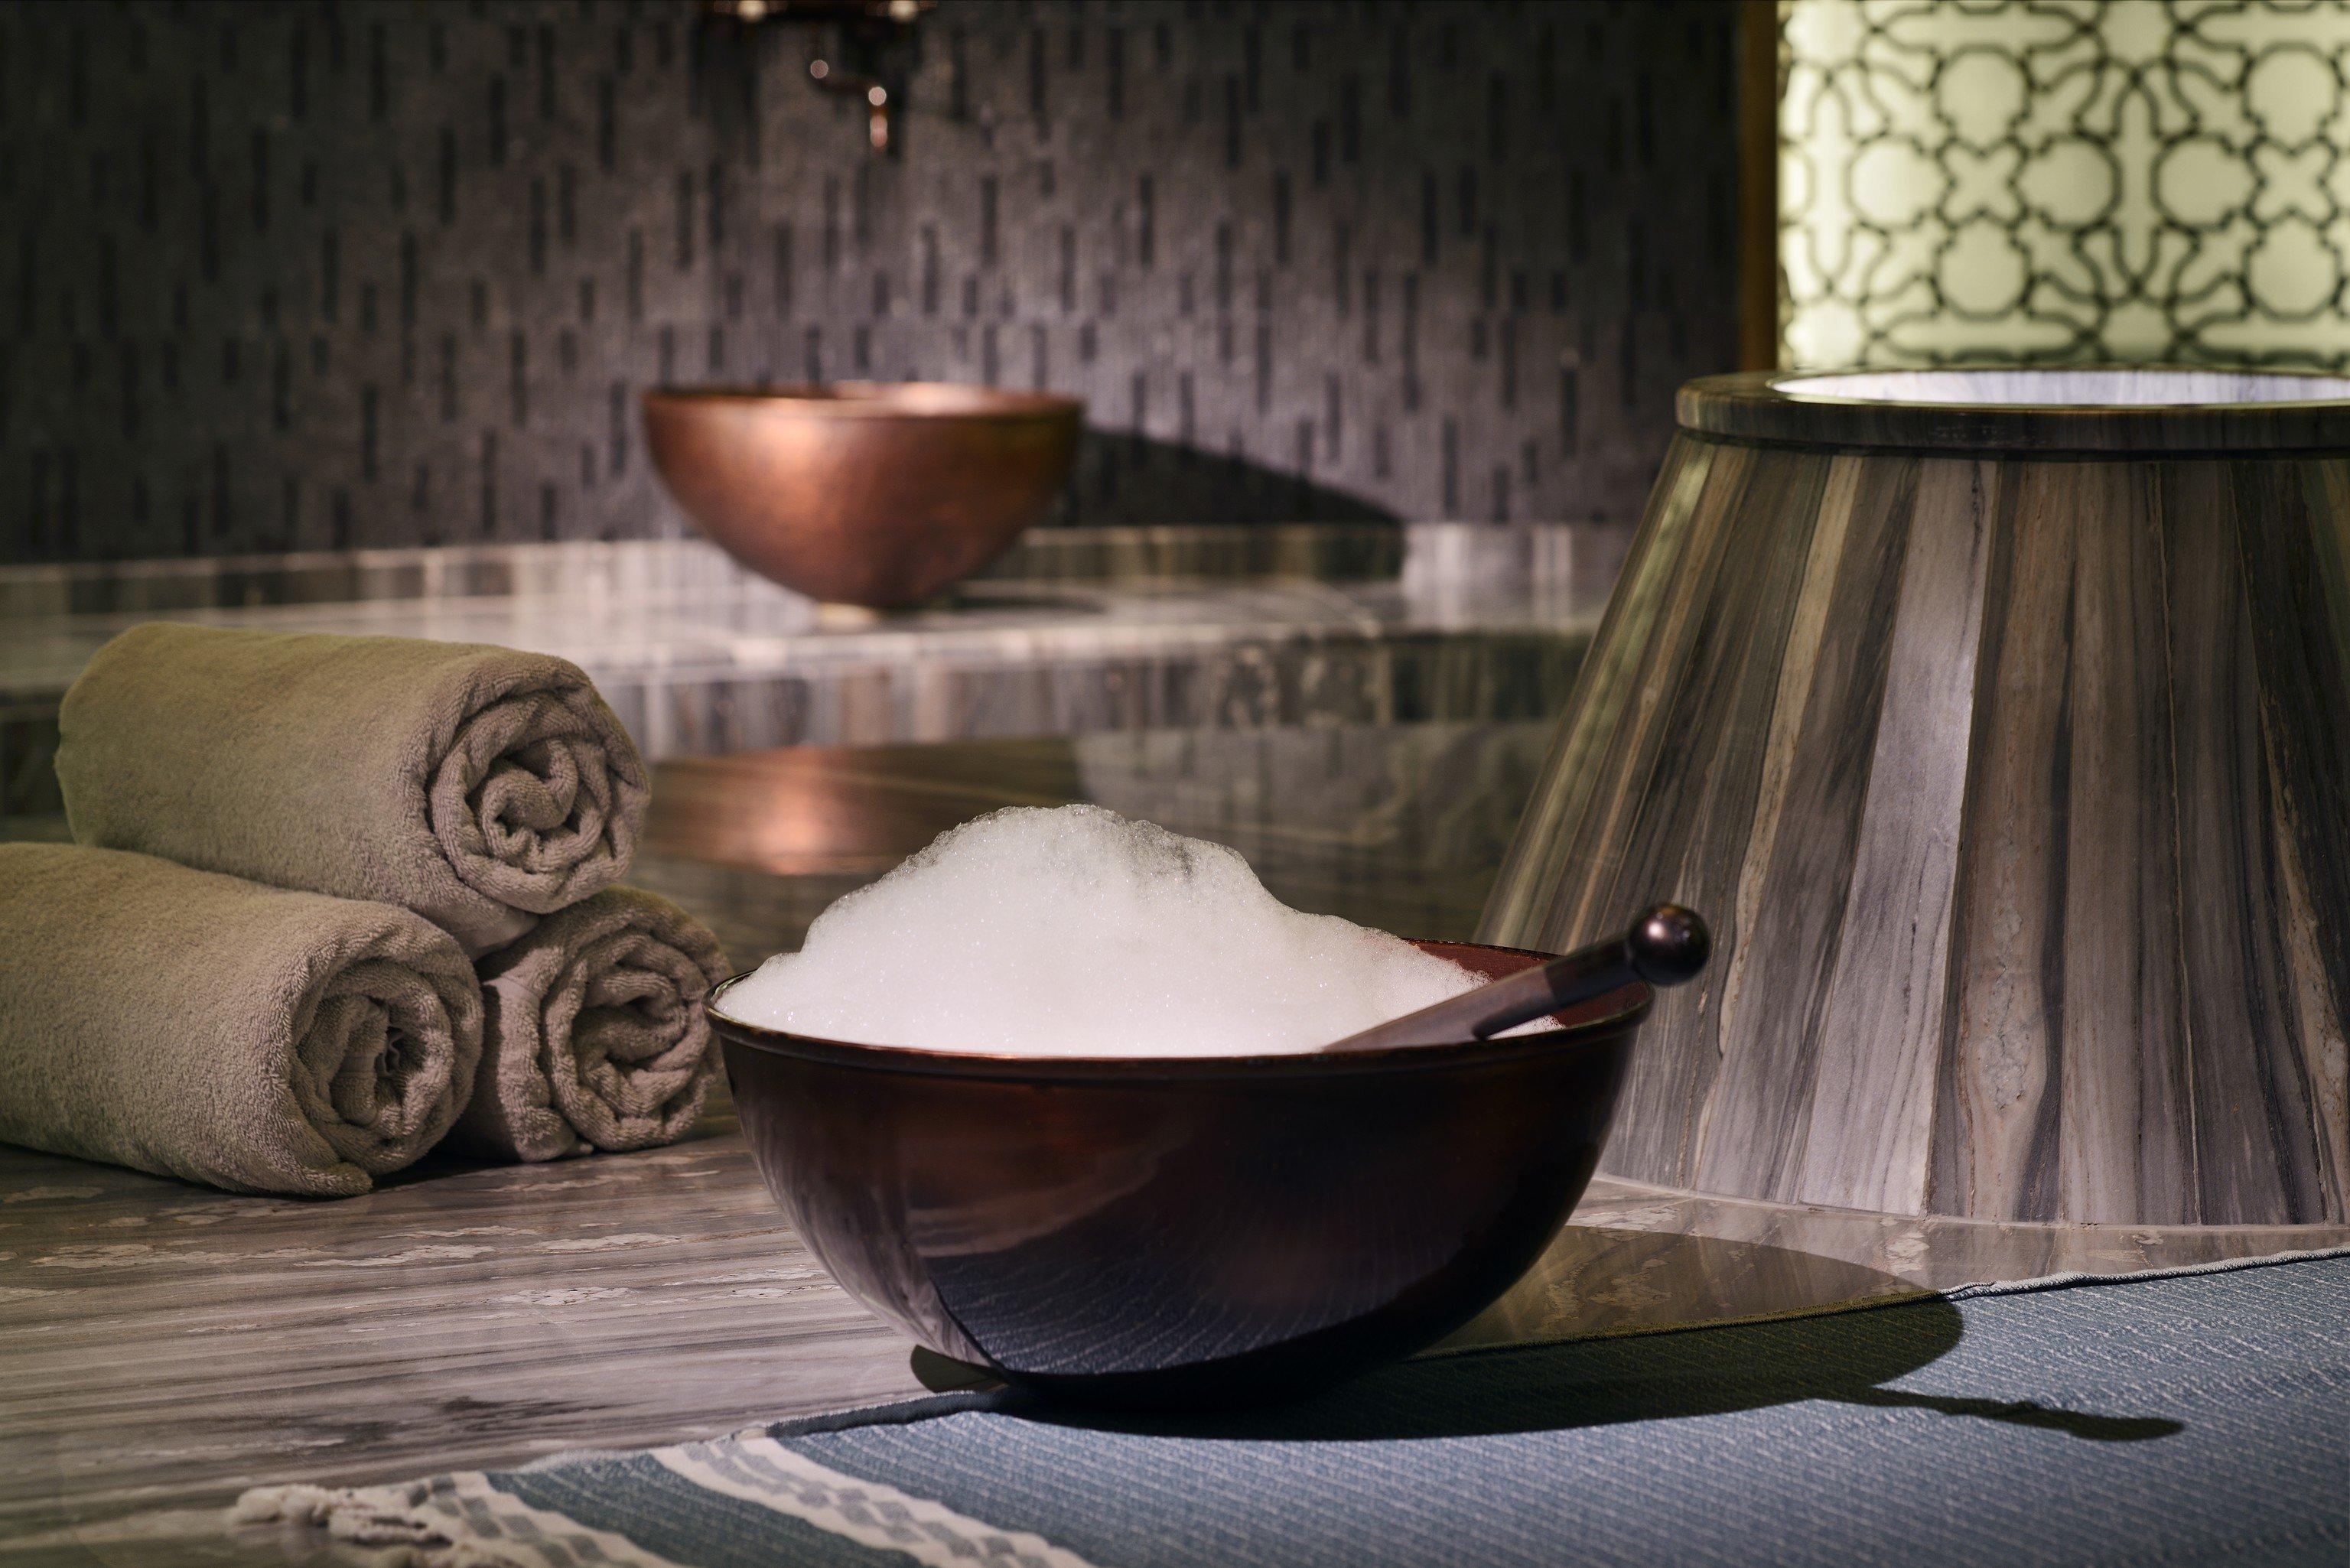 Health + Wellness Trip Ideas indoor flooring furniture interior design table still life photography ceramic floor tableware product design still life